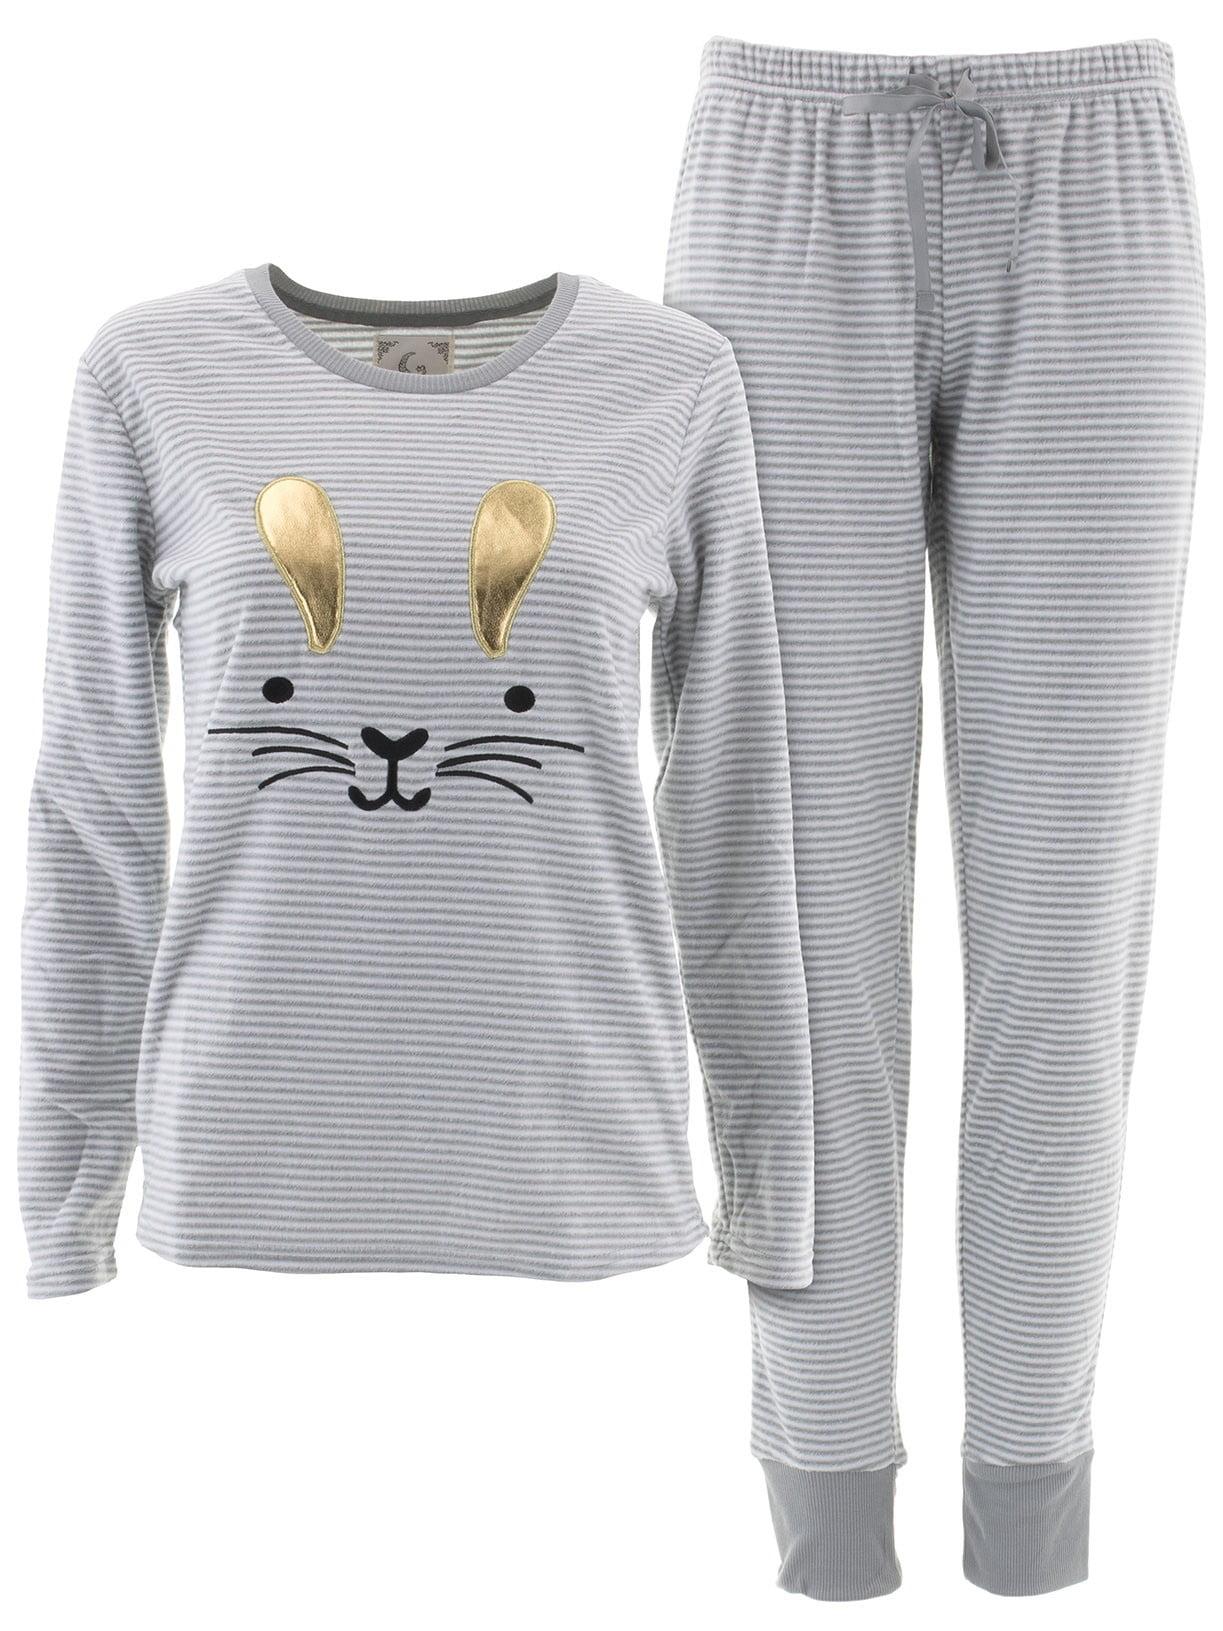 PJ Couture Women/'s Gray Bunny Fleece Pajamas